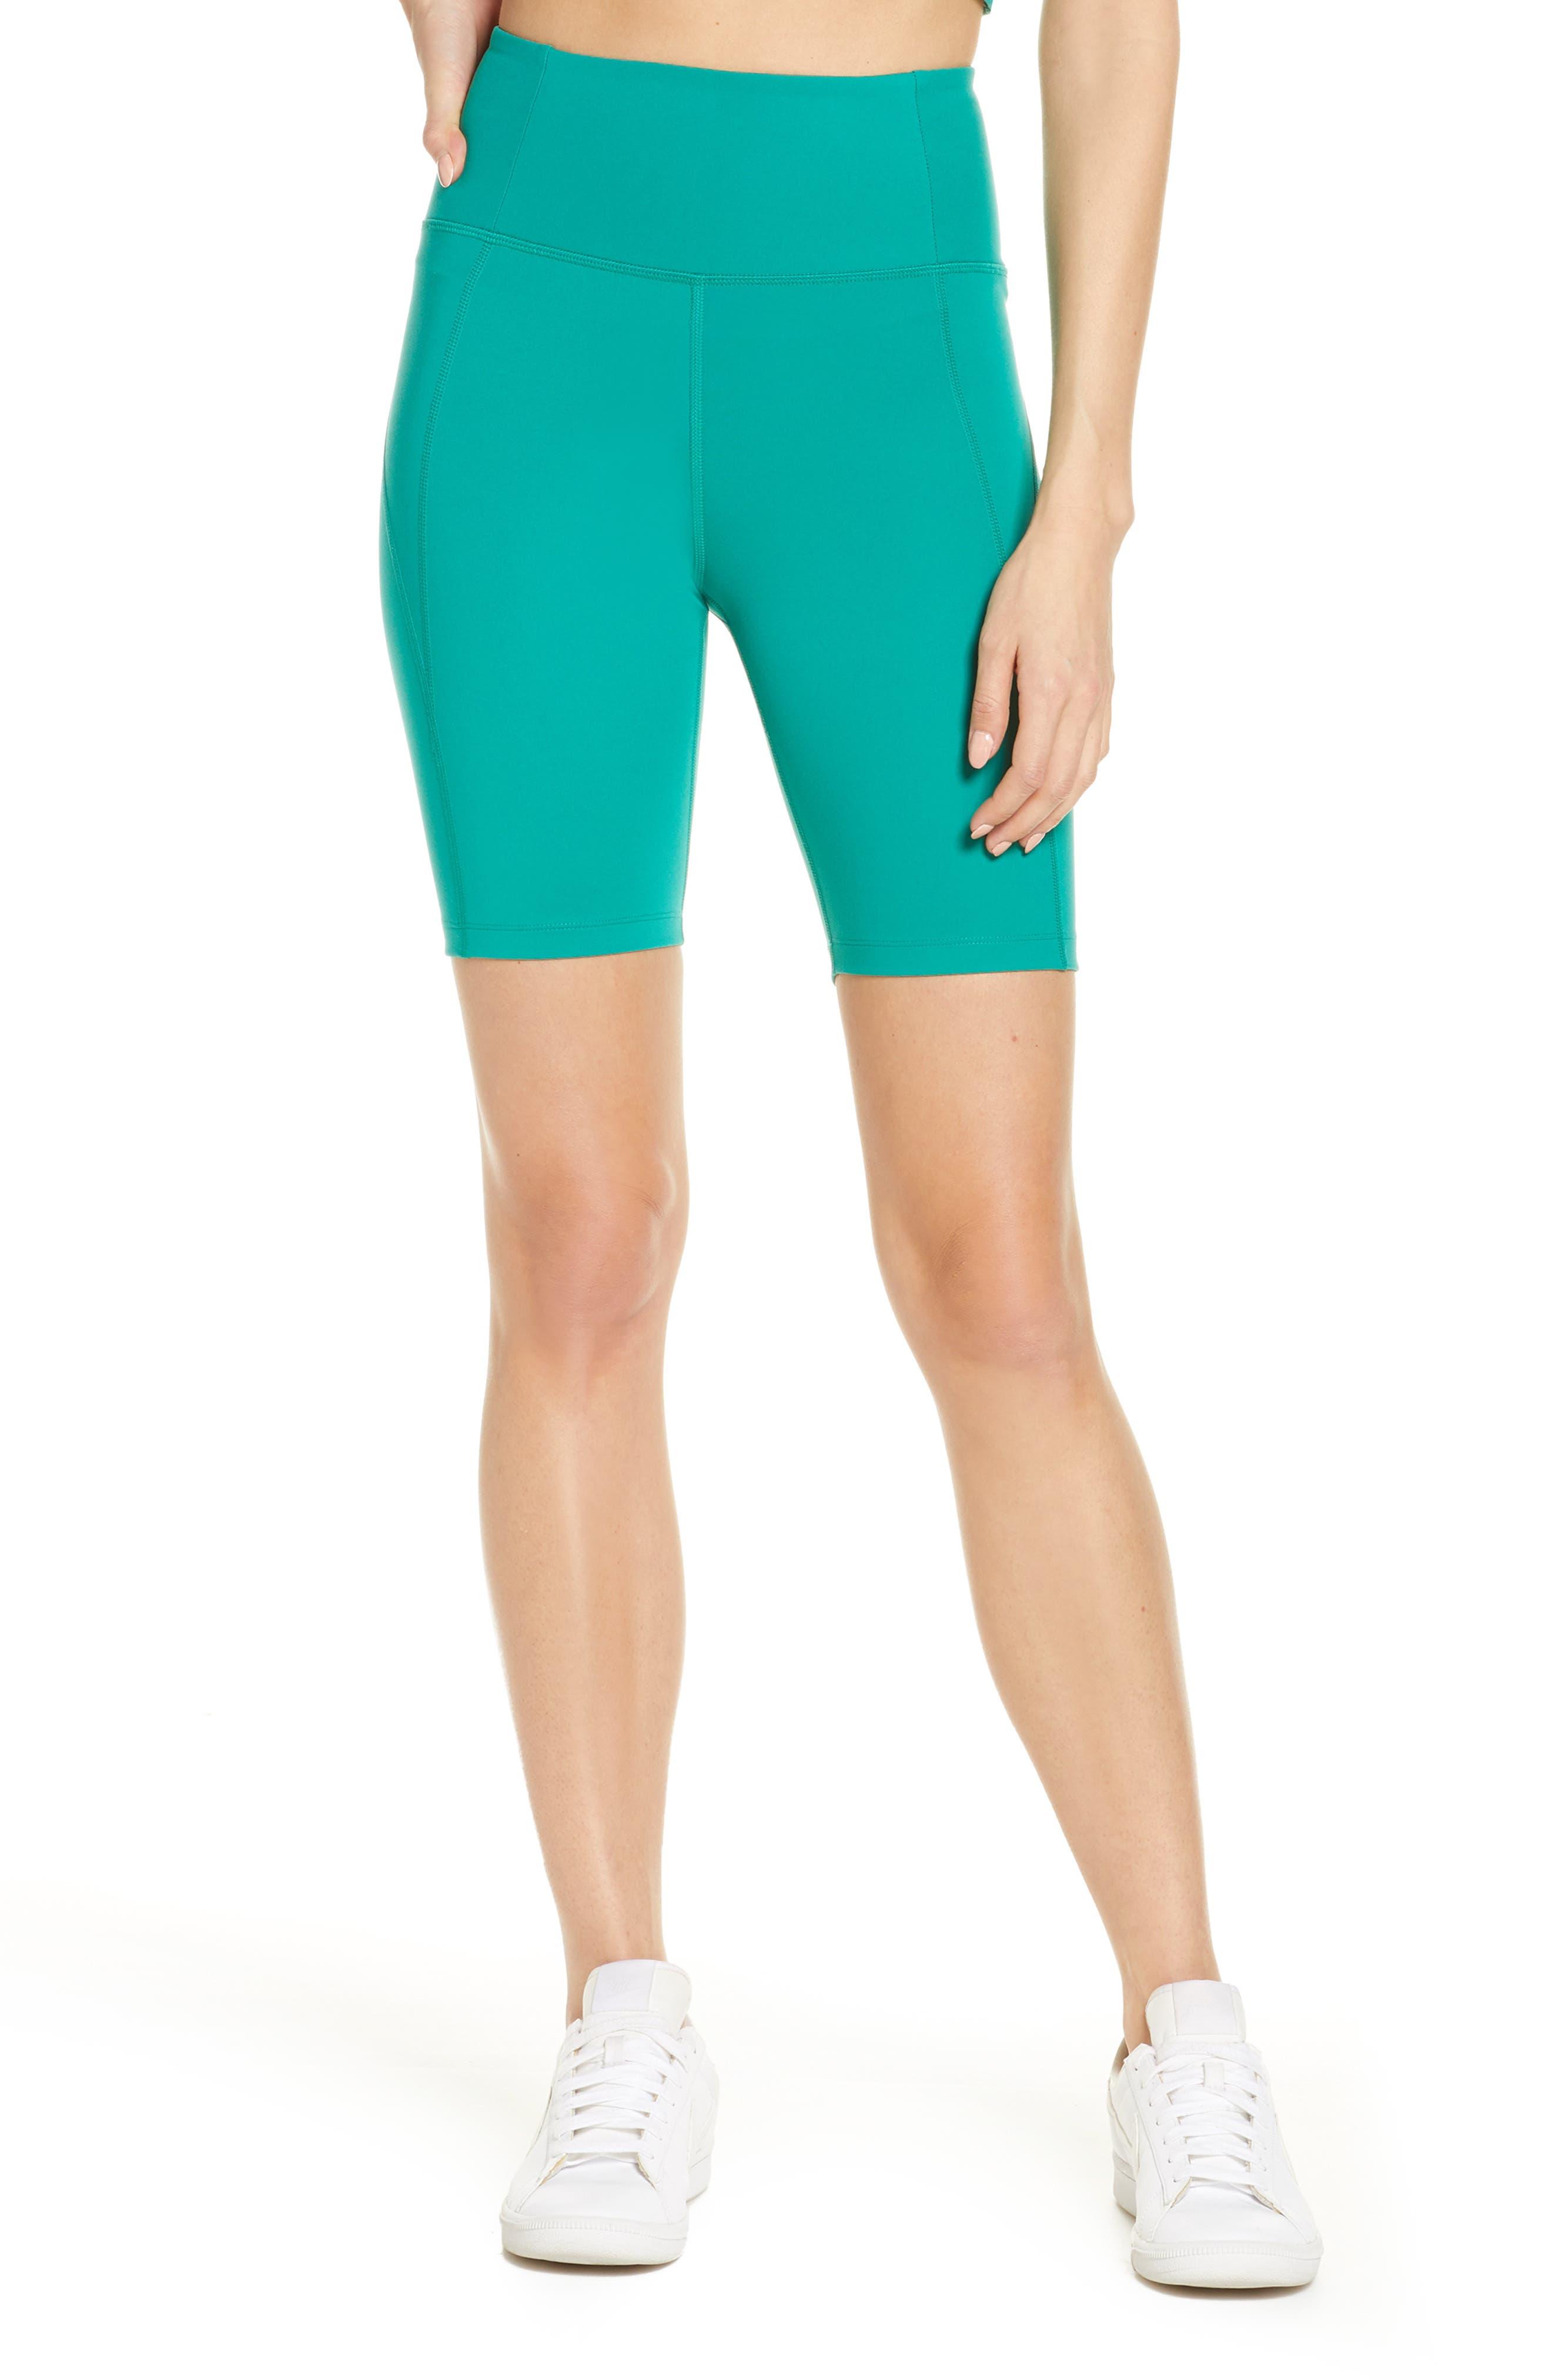 Plus  Women's Girlfriend Collective High Waist Bike Shorts,  3X-Large - Green